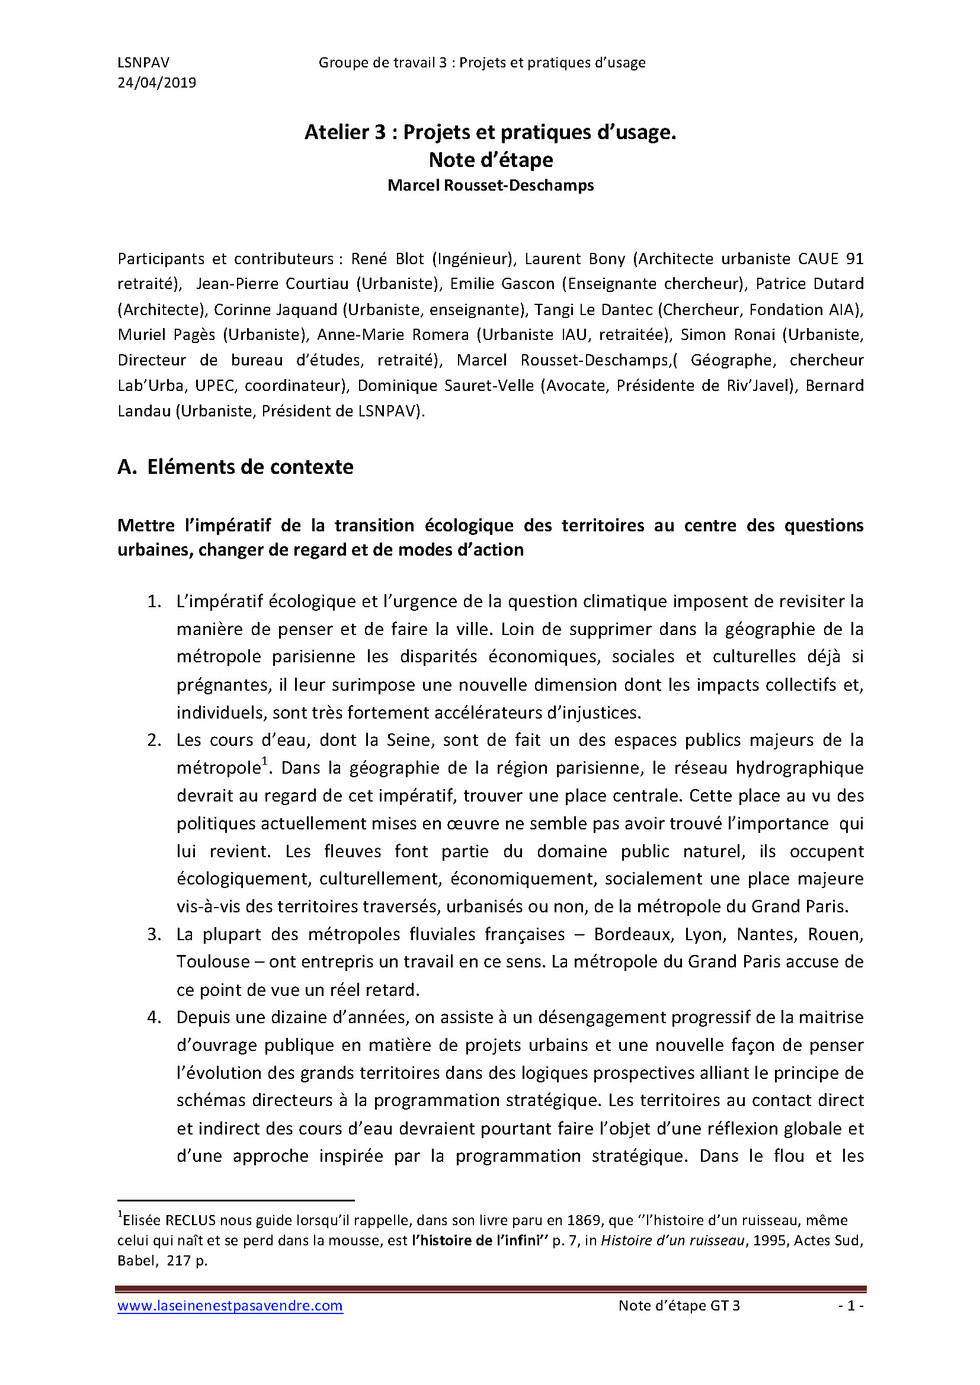 GT 3 Note d'étape_Page_01.jpg